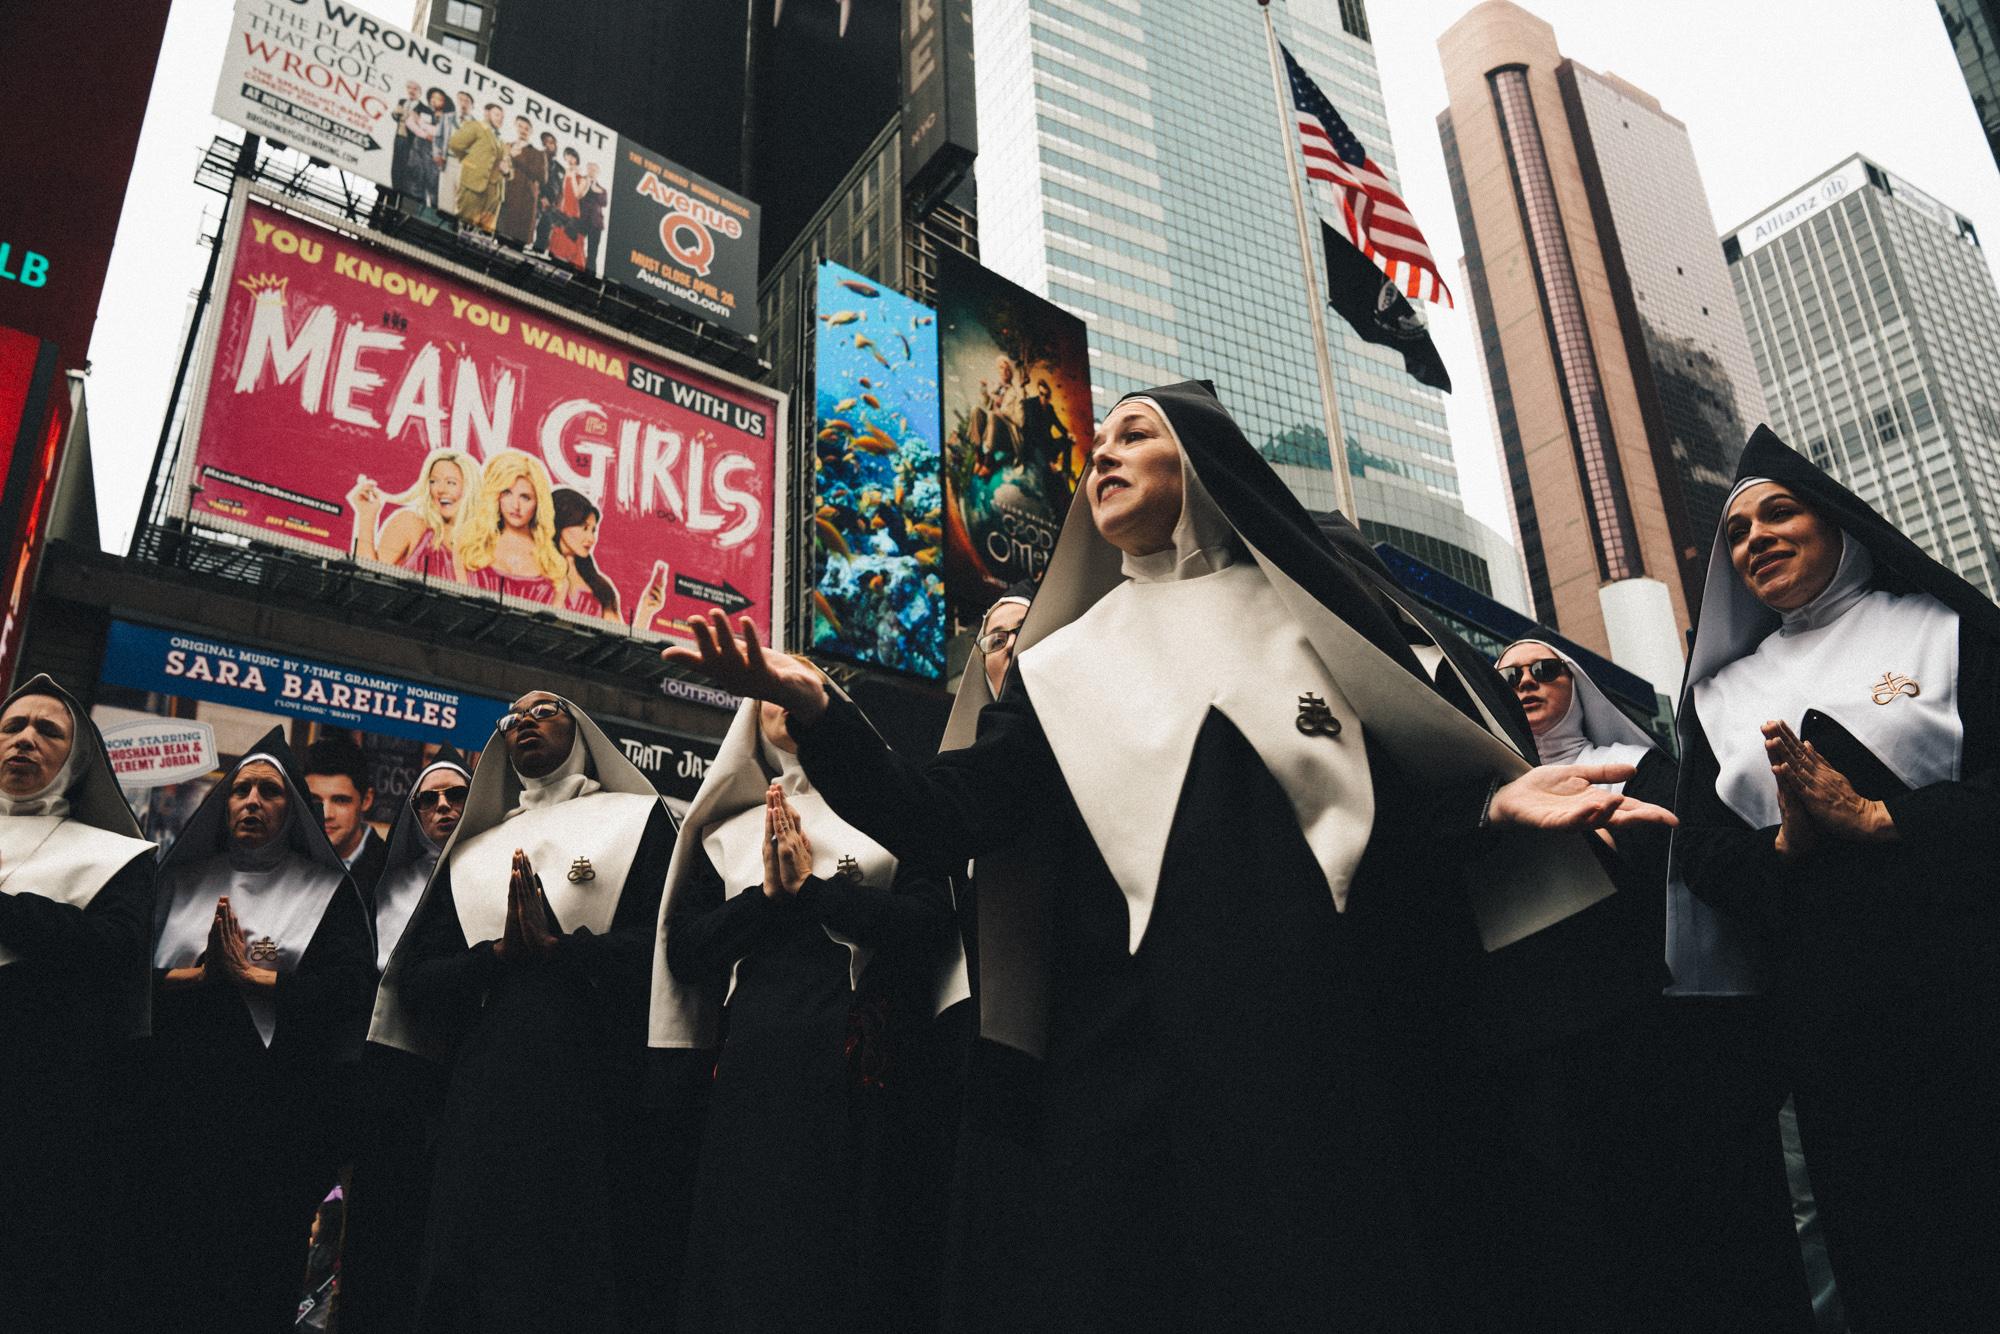 Good-Omens-chattering nuns_hal-kirkland_NYC.jpg